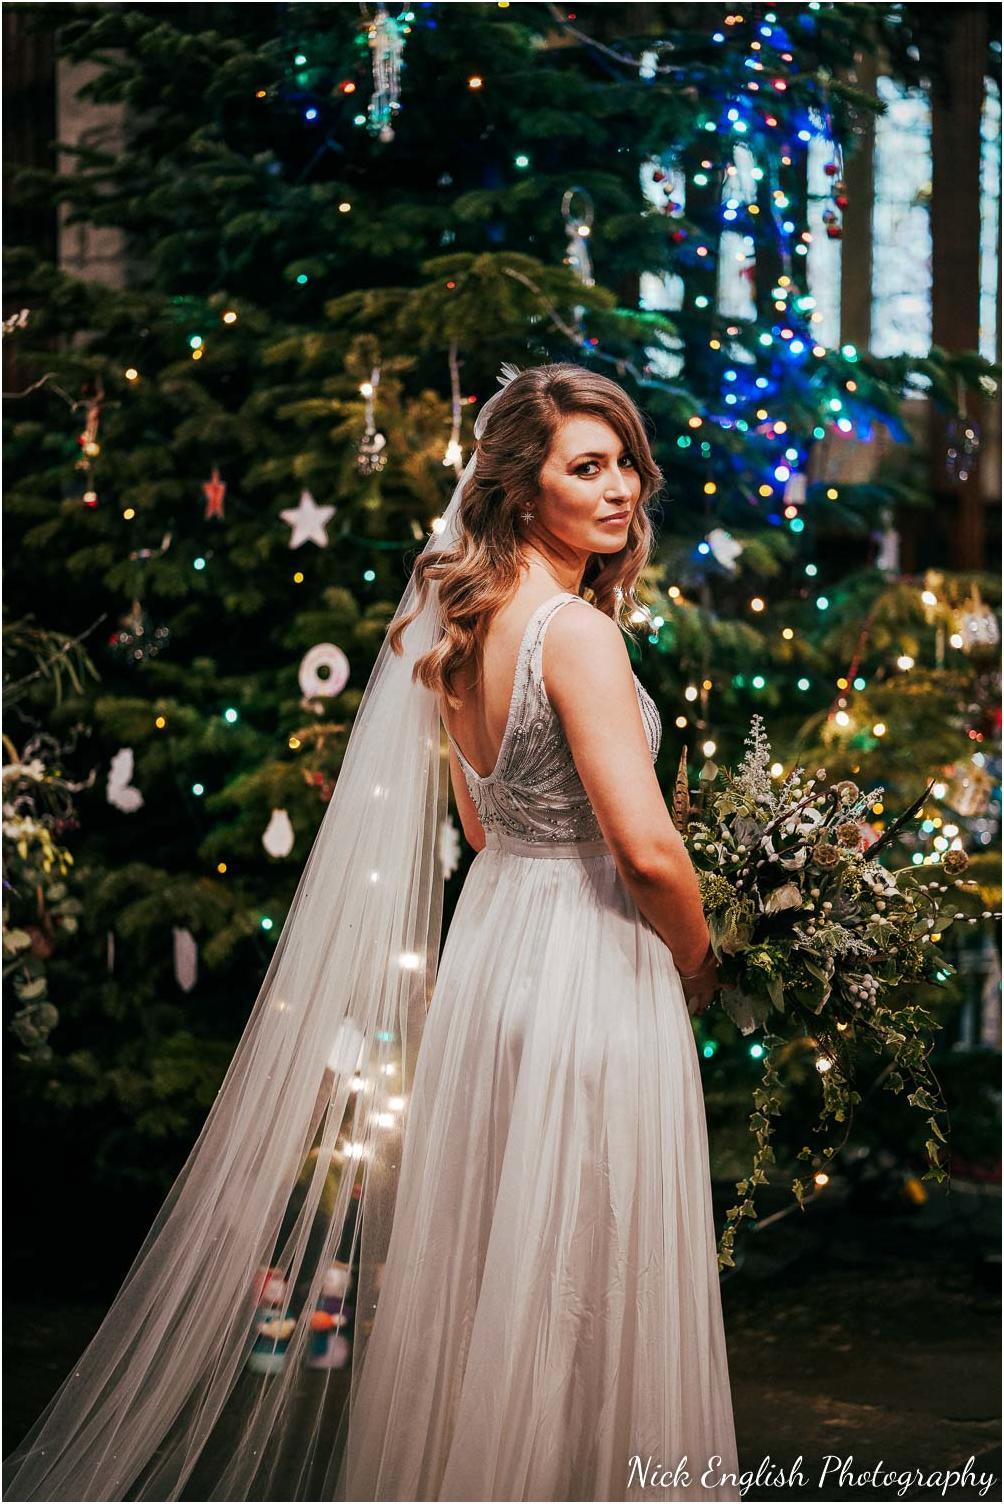 Mitton_Hall_Christmas_Winter_Wedding-52.jpg